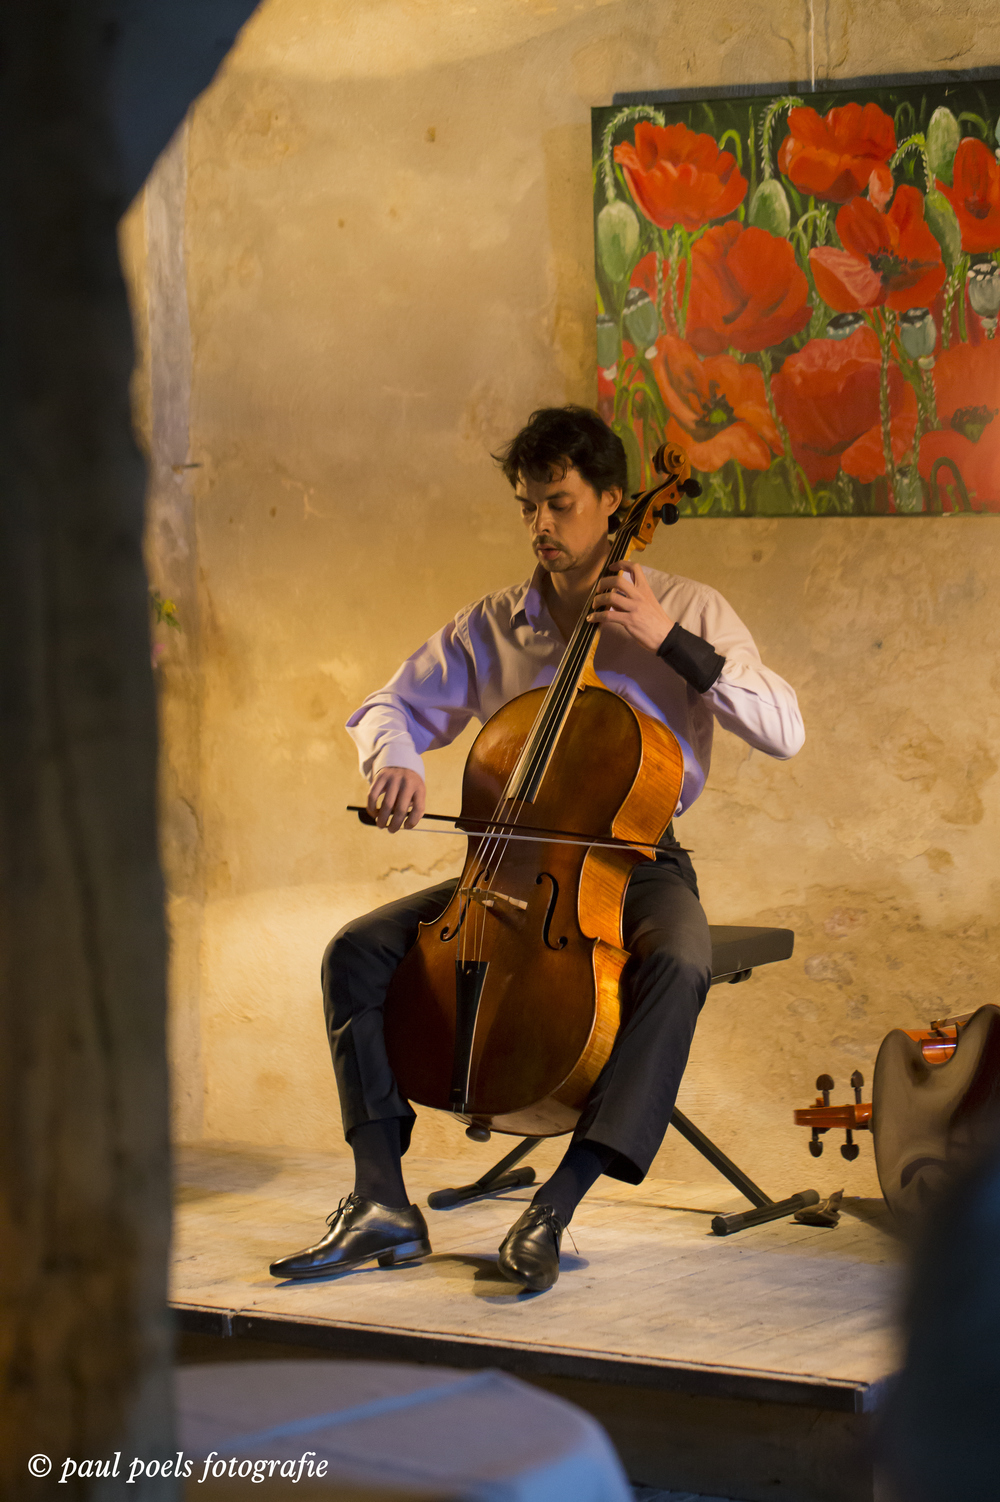 7th-June- Bach-in-het-Kasteelke-Meerlo-Detmar-Leertouwer-Dominus-Maris-Music-Productions-V.jpg